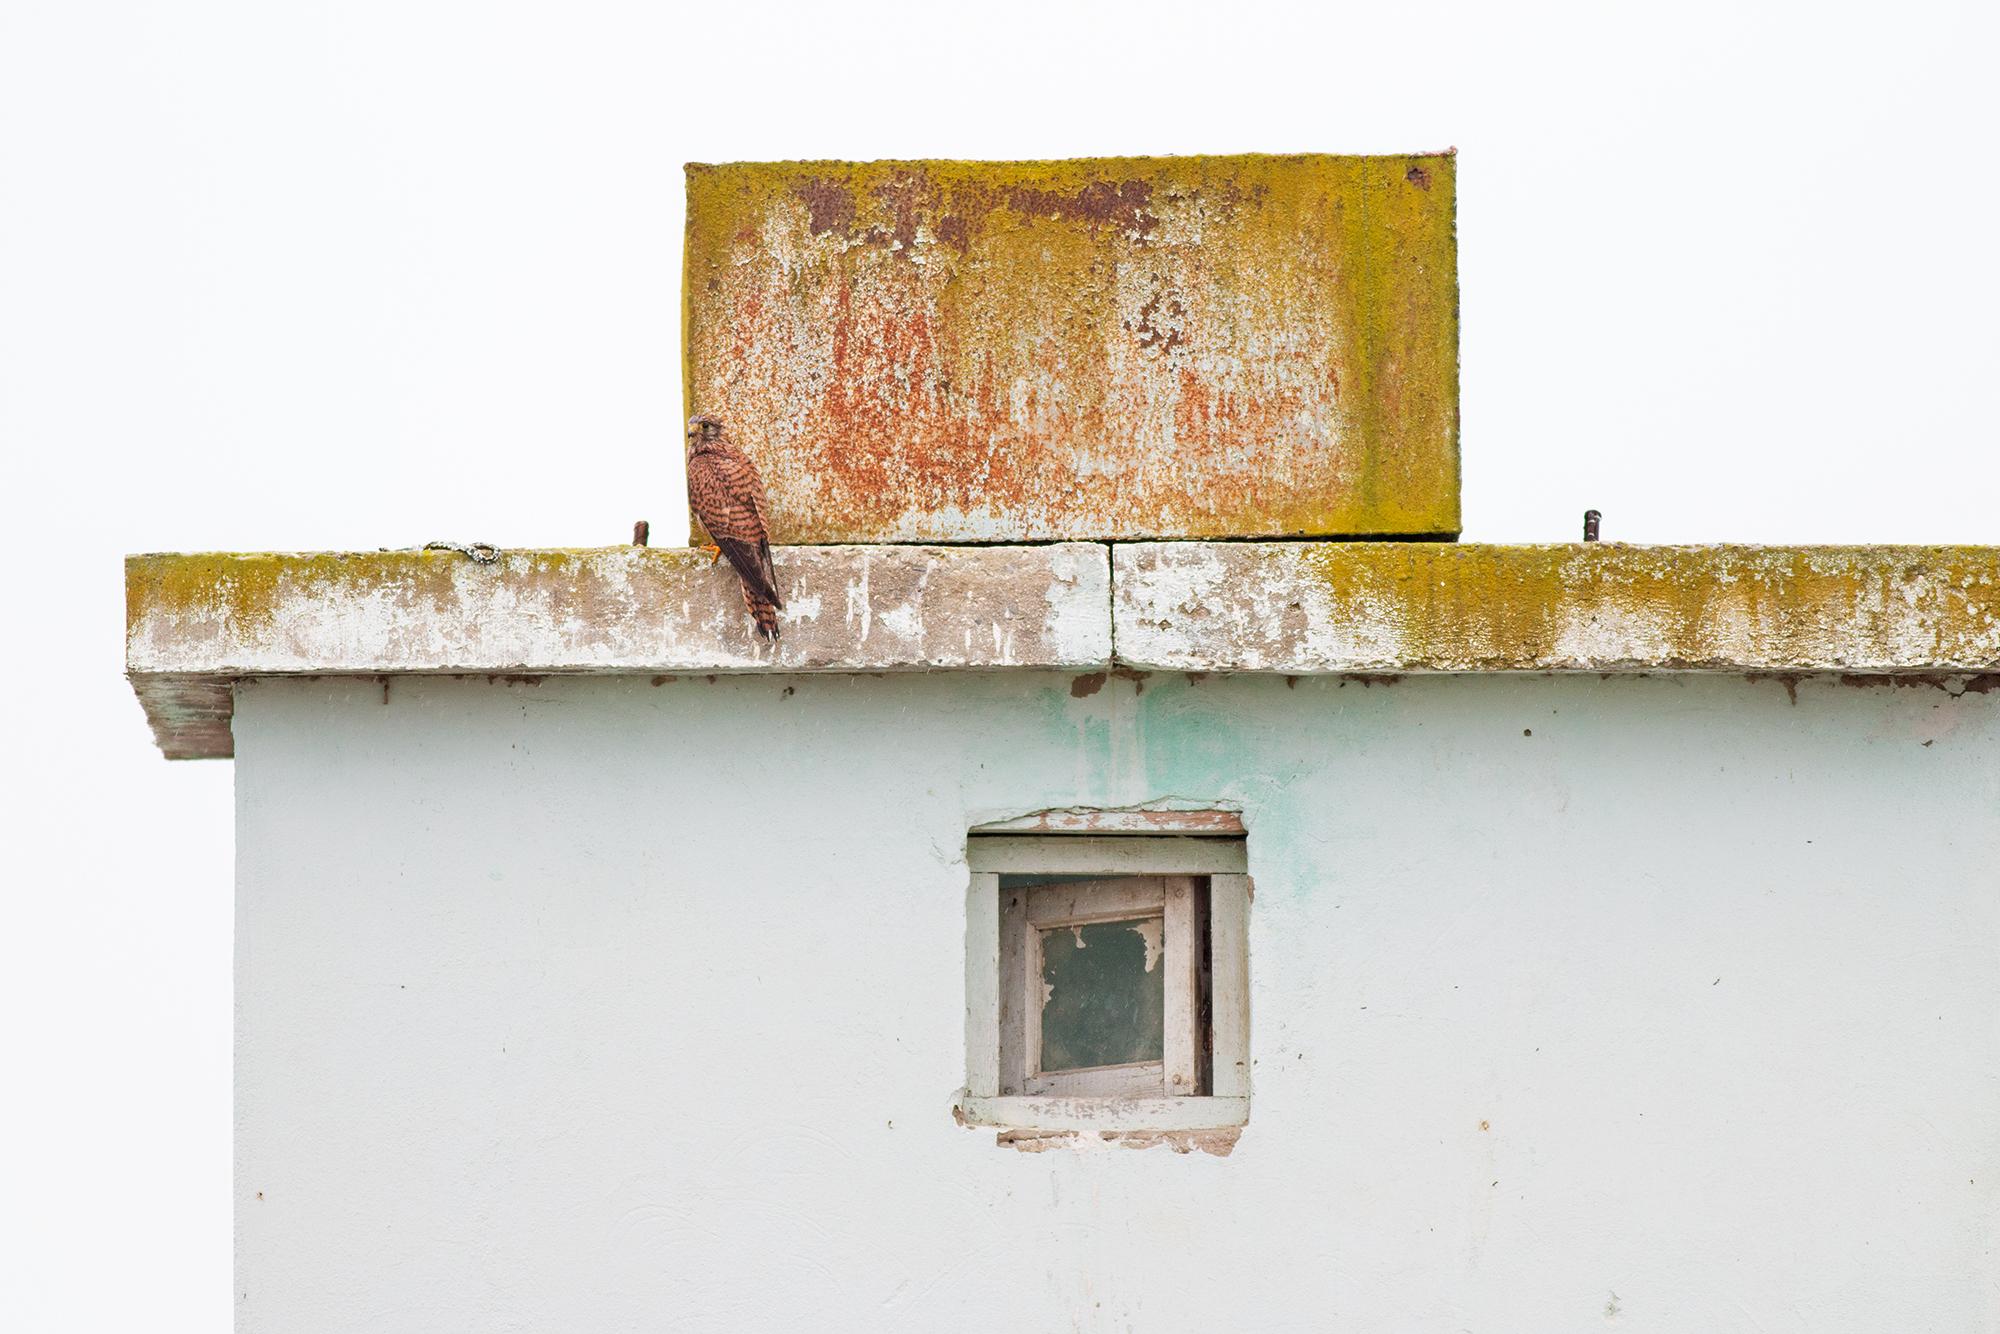 Tornfalk-JPEG_web.jpg